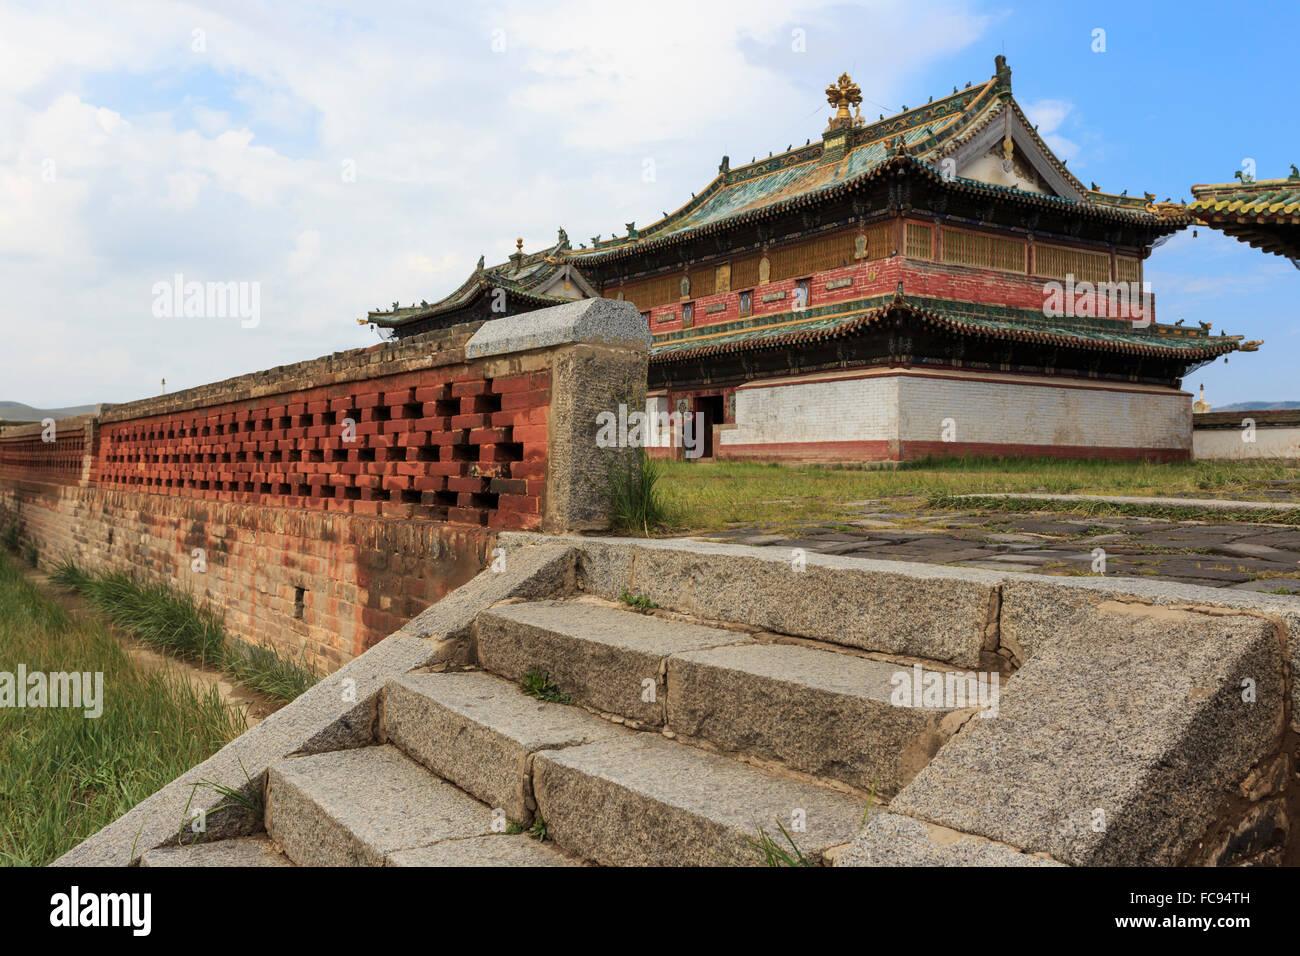 Zuu of Buddha temple, Erdene Zuu Khiid, Buddhist Monastery, Kharkhorin (Karakorum), Central Mongolia, Central Asia, - Stock Image